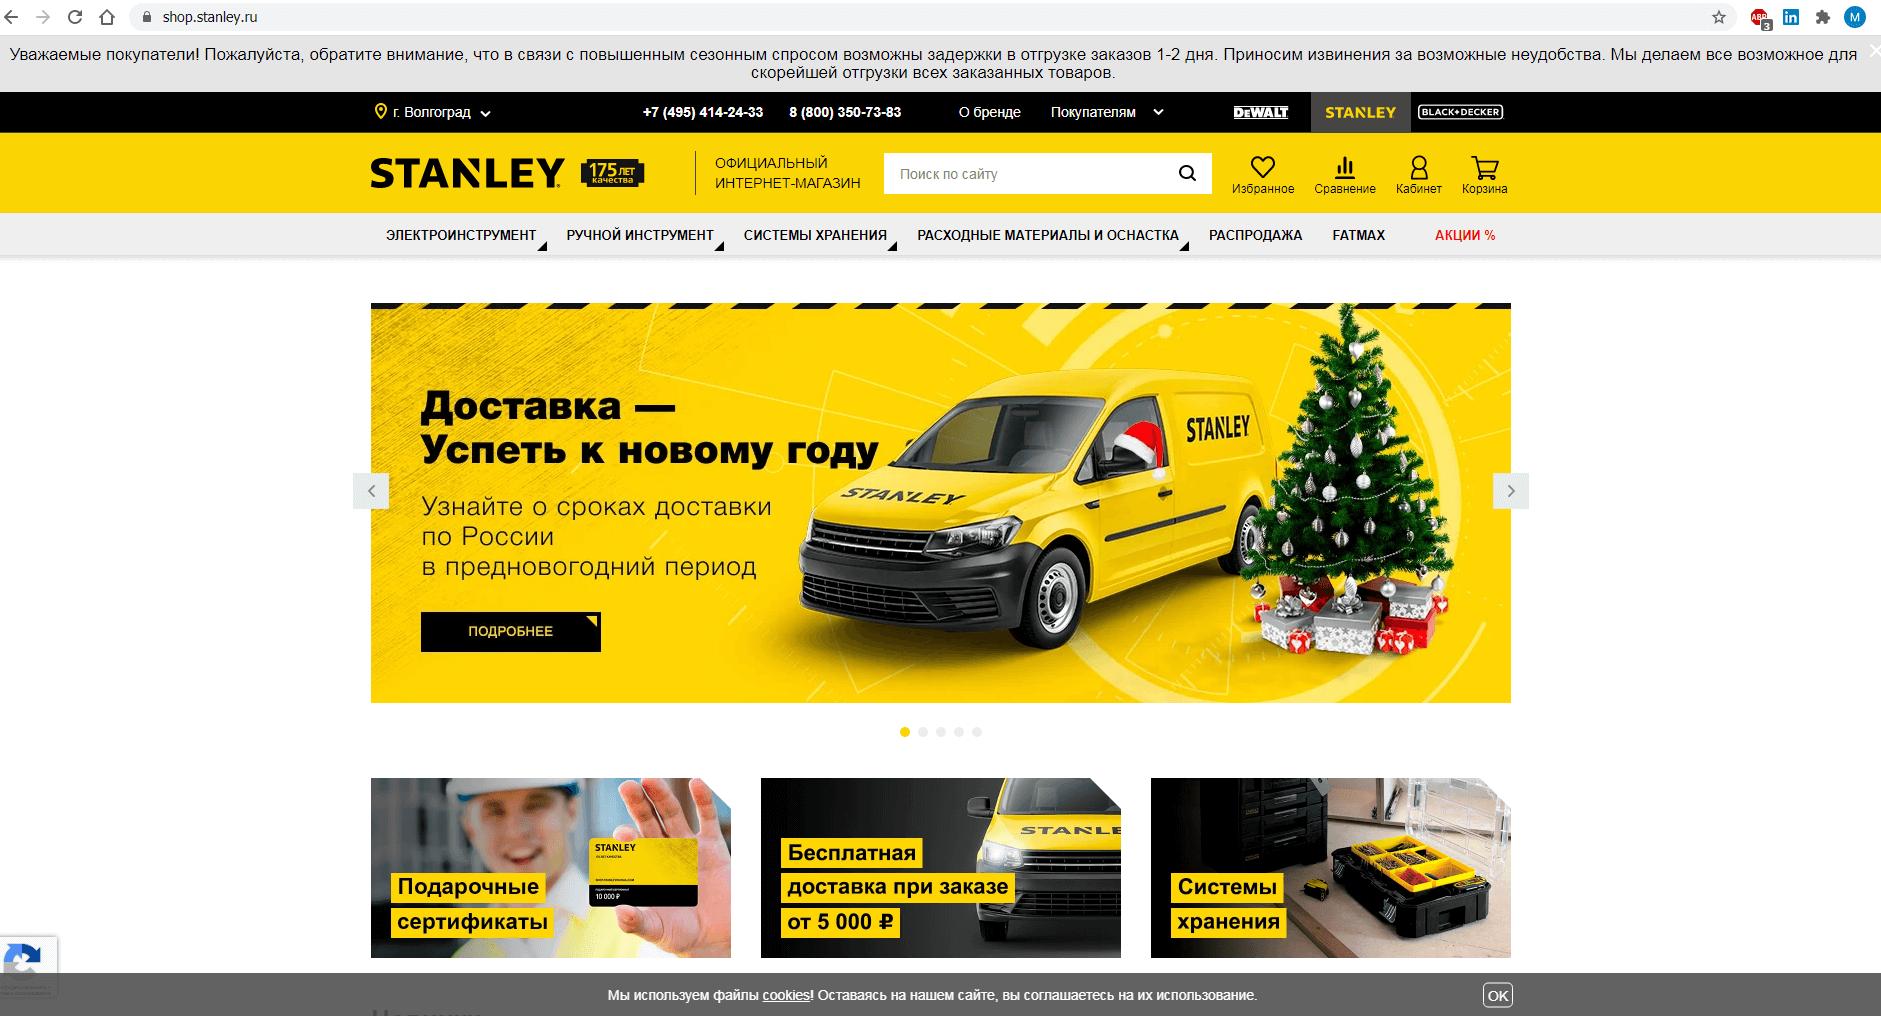 shop.stanley.ru website